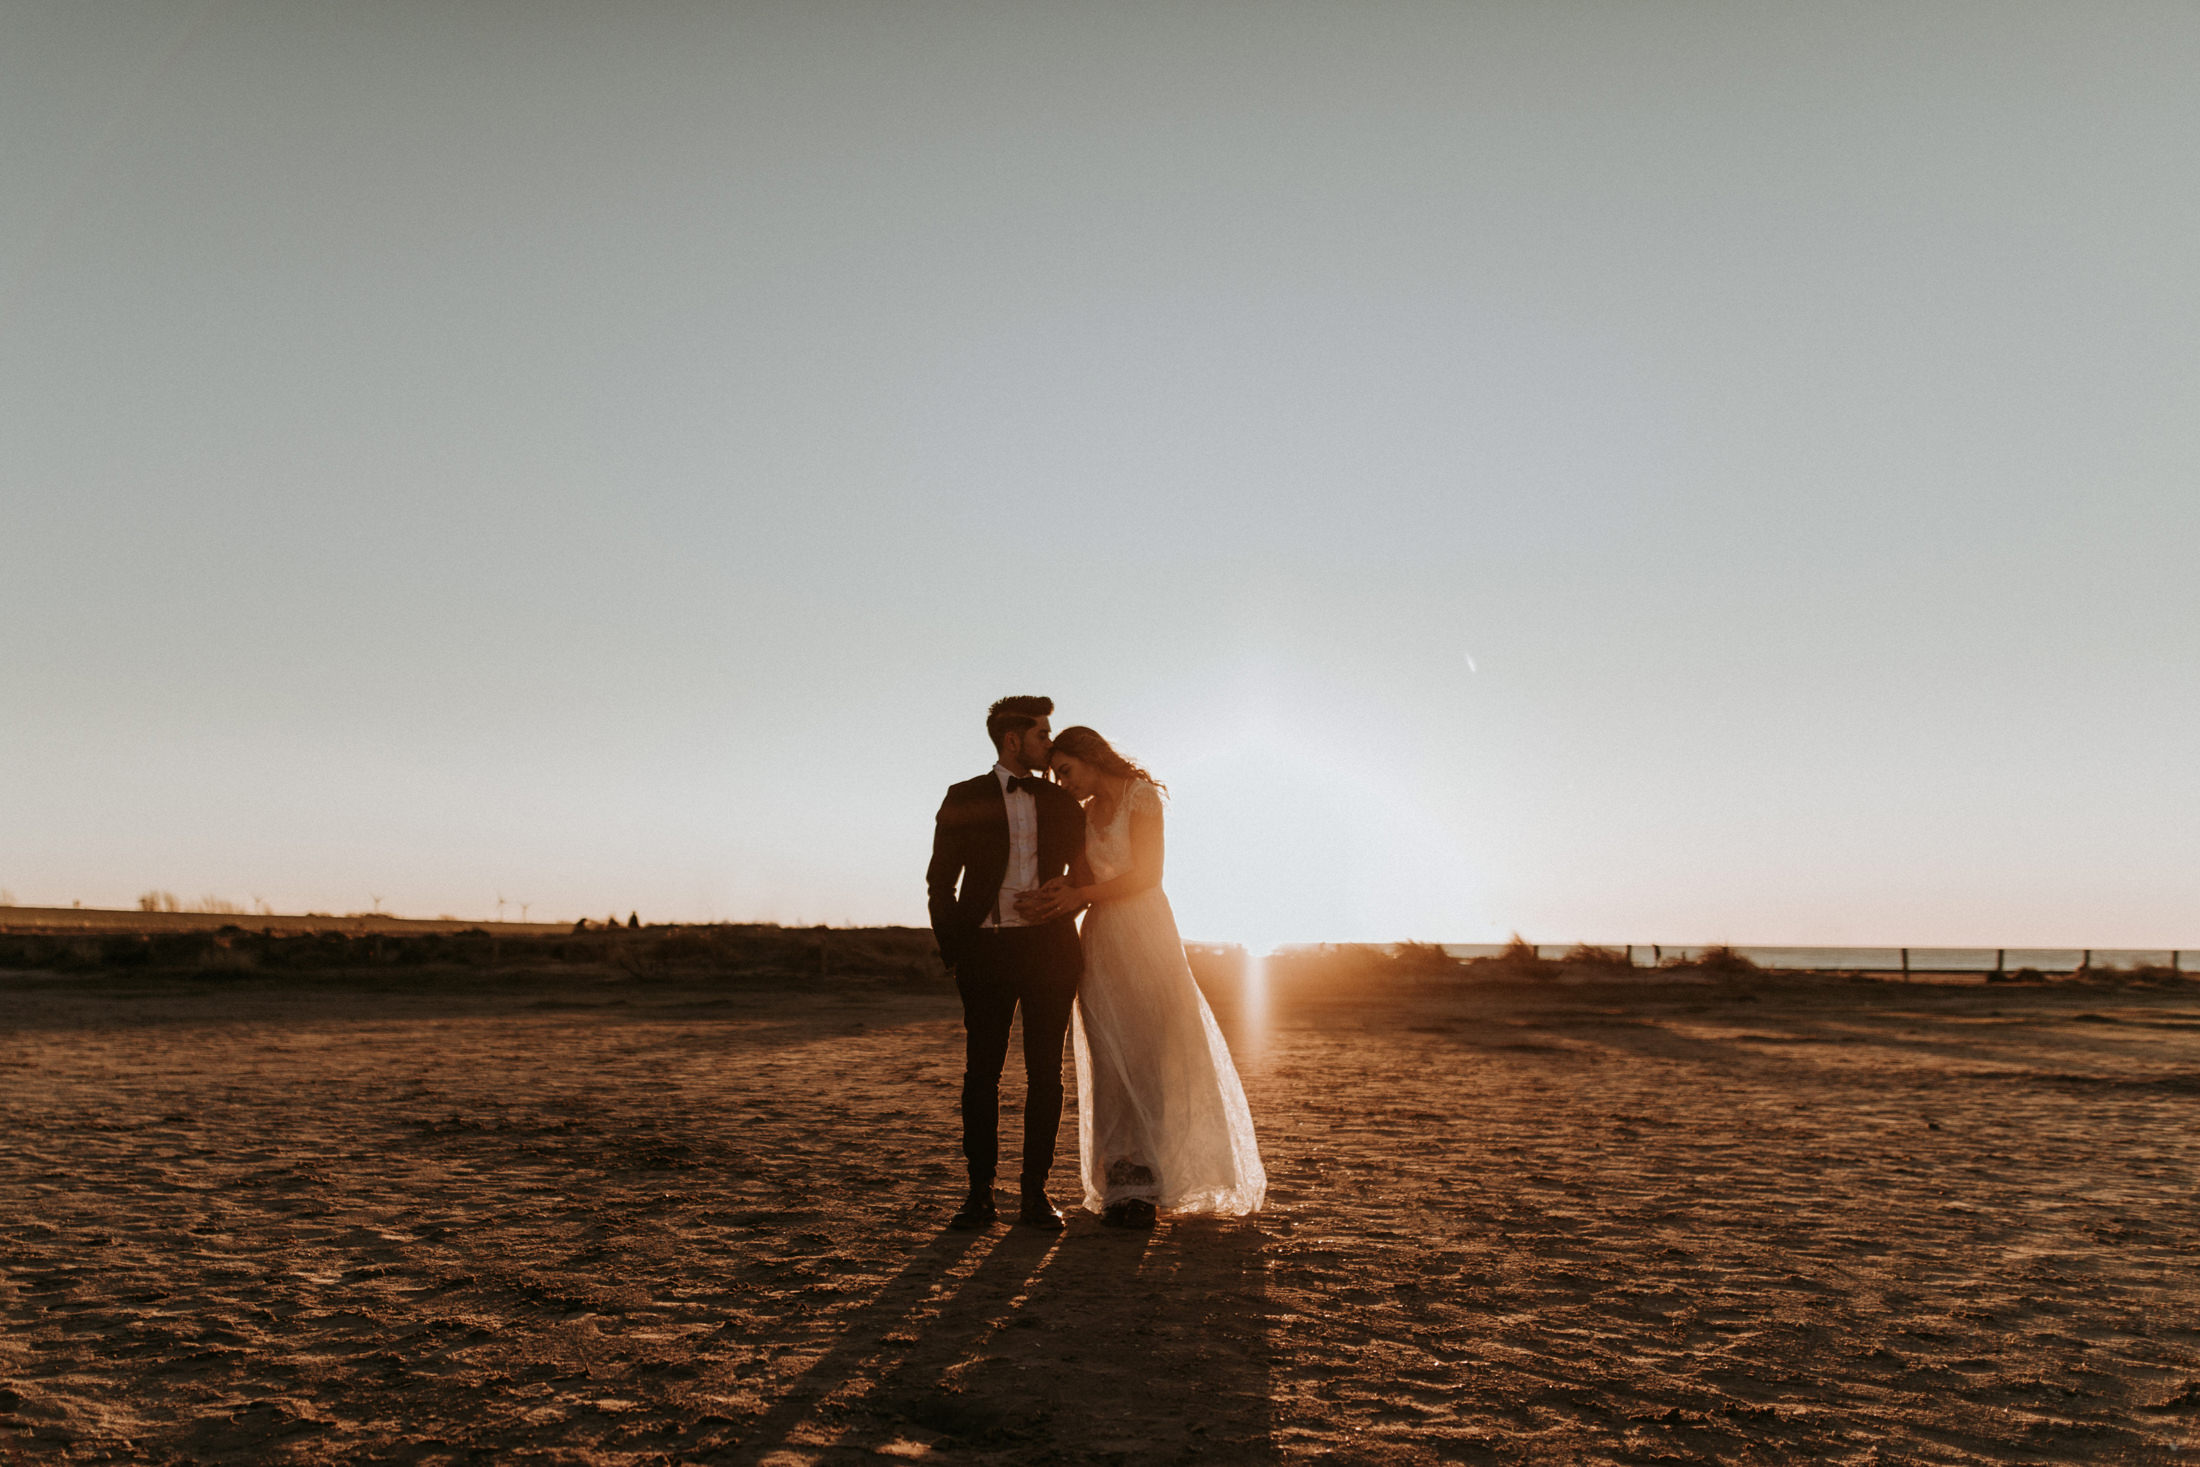 Wedding_Photographer_Mallorca_Daniela-Marquardt_Photography_CanaryIslands_Lanzarote_Iceland_Tuskany_Santorini_Portugal_Schweiz_Austria_Bayern_Elopement_Hochzeitsfotograf_Norddeichich_72